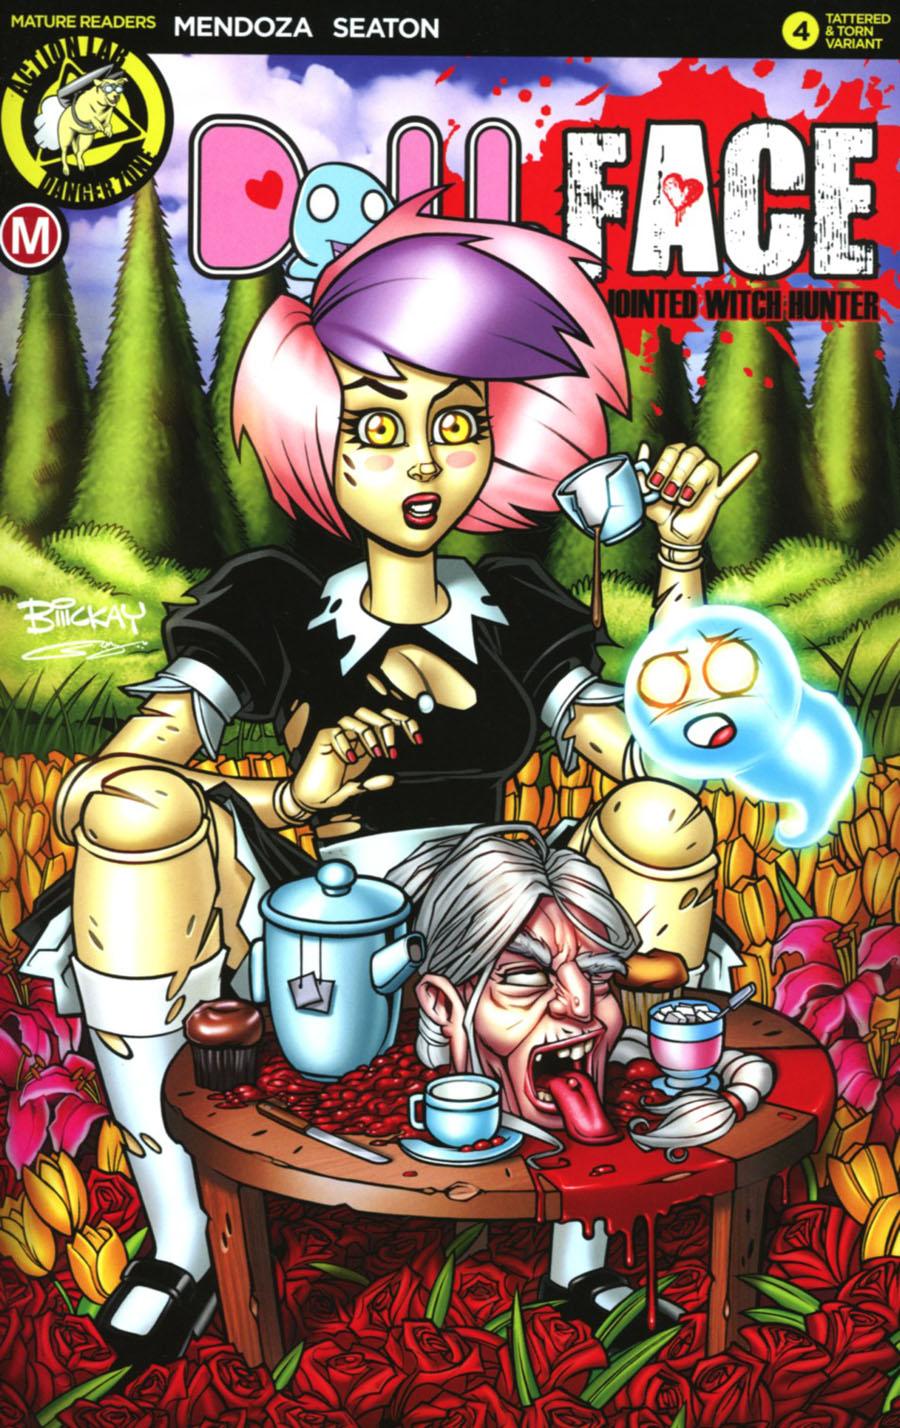 Dollface #4 Cover E Variant Bill McKay Artist Tattered & Torn Cover